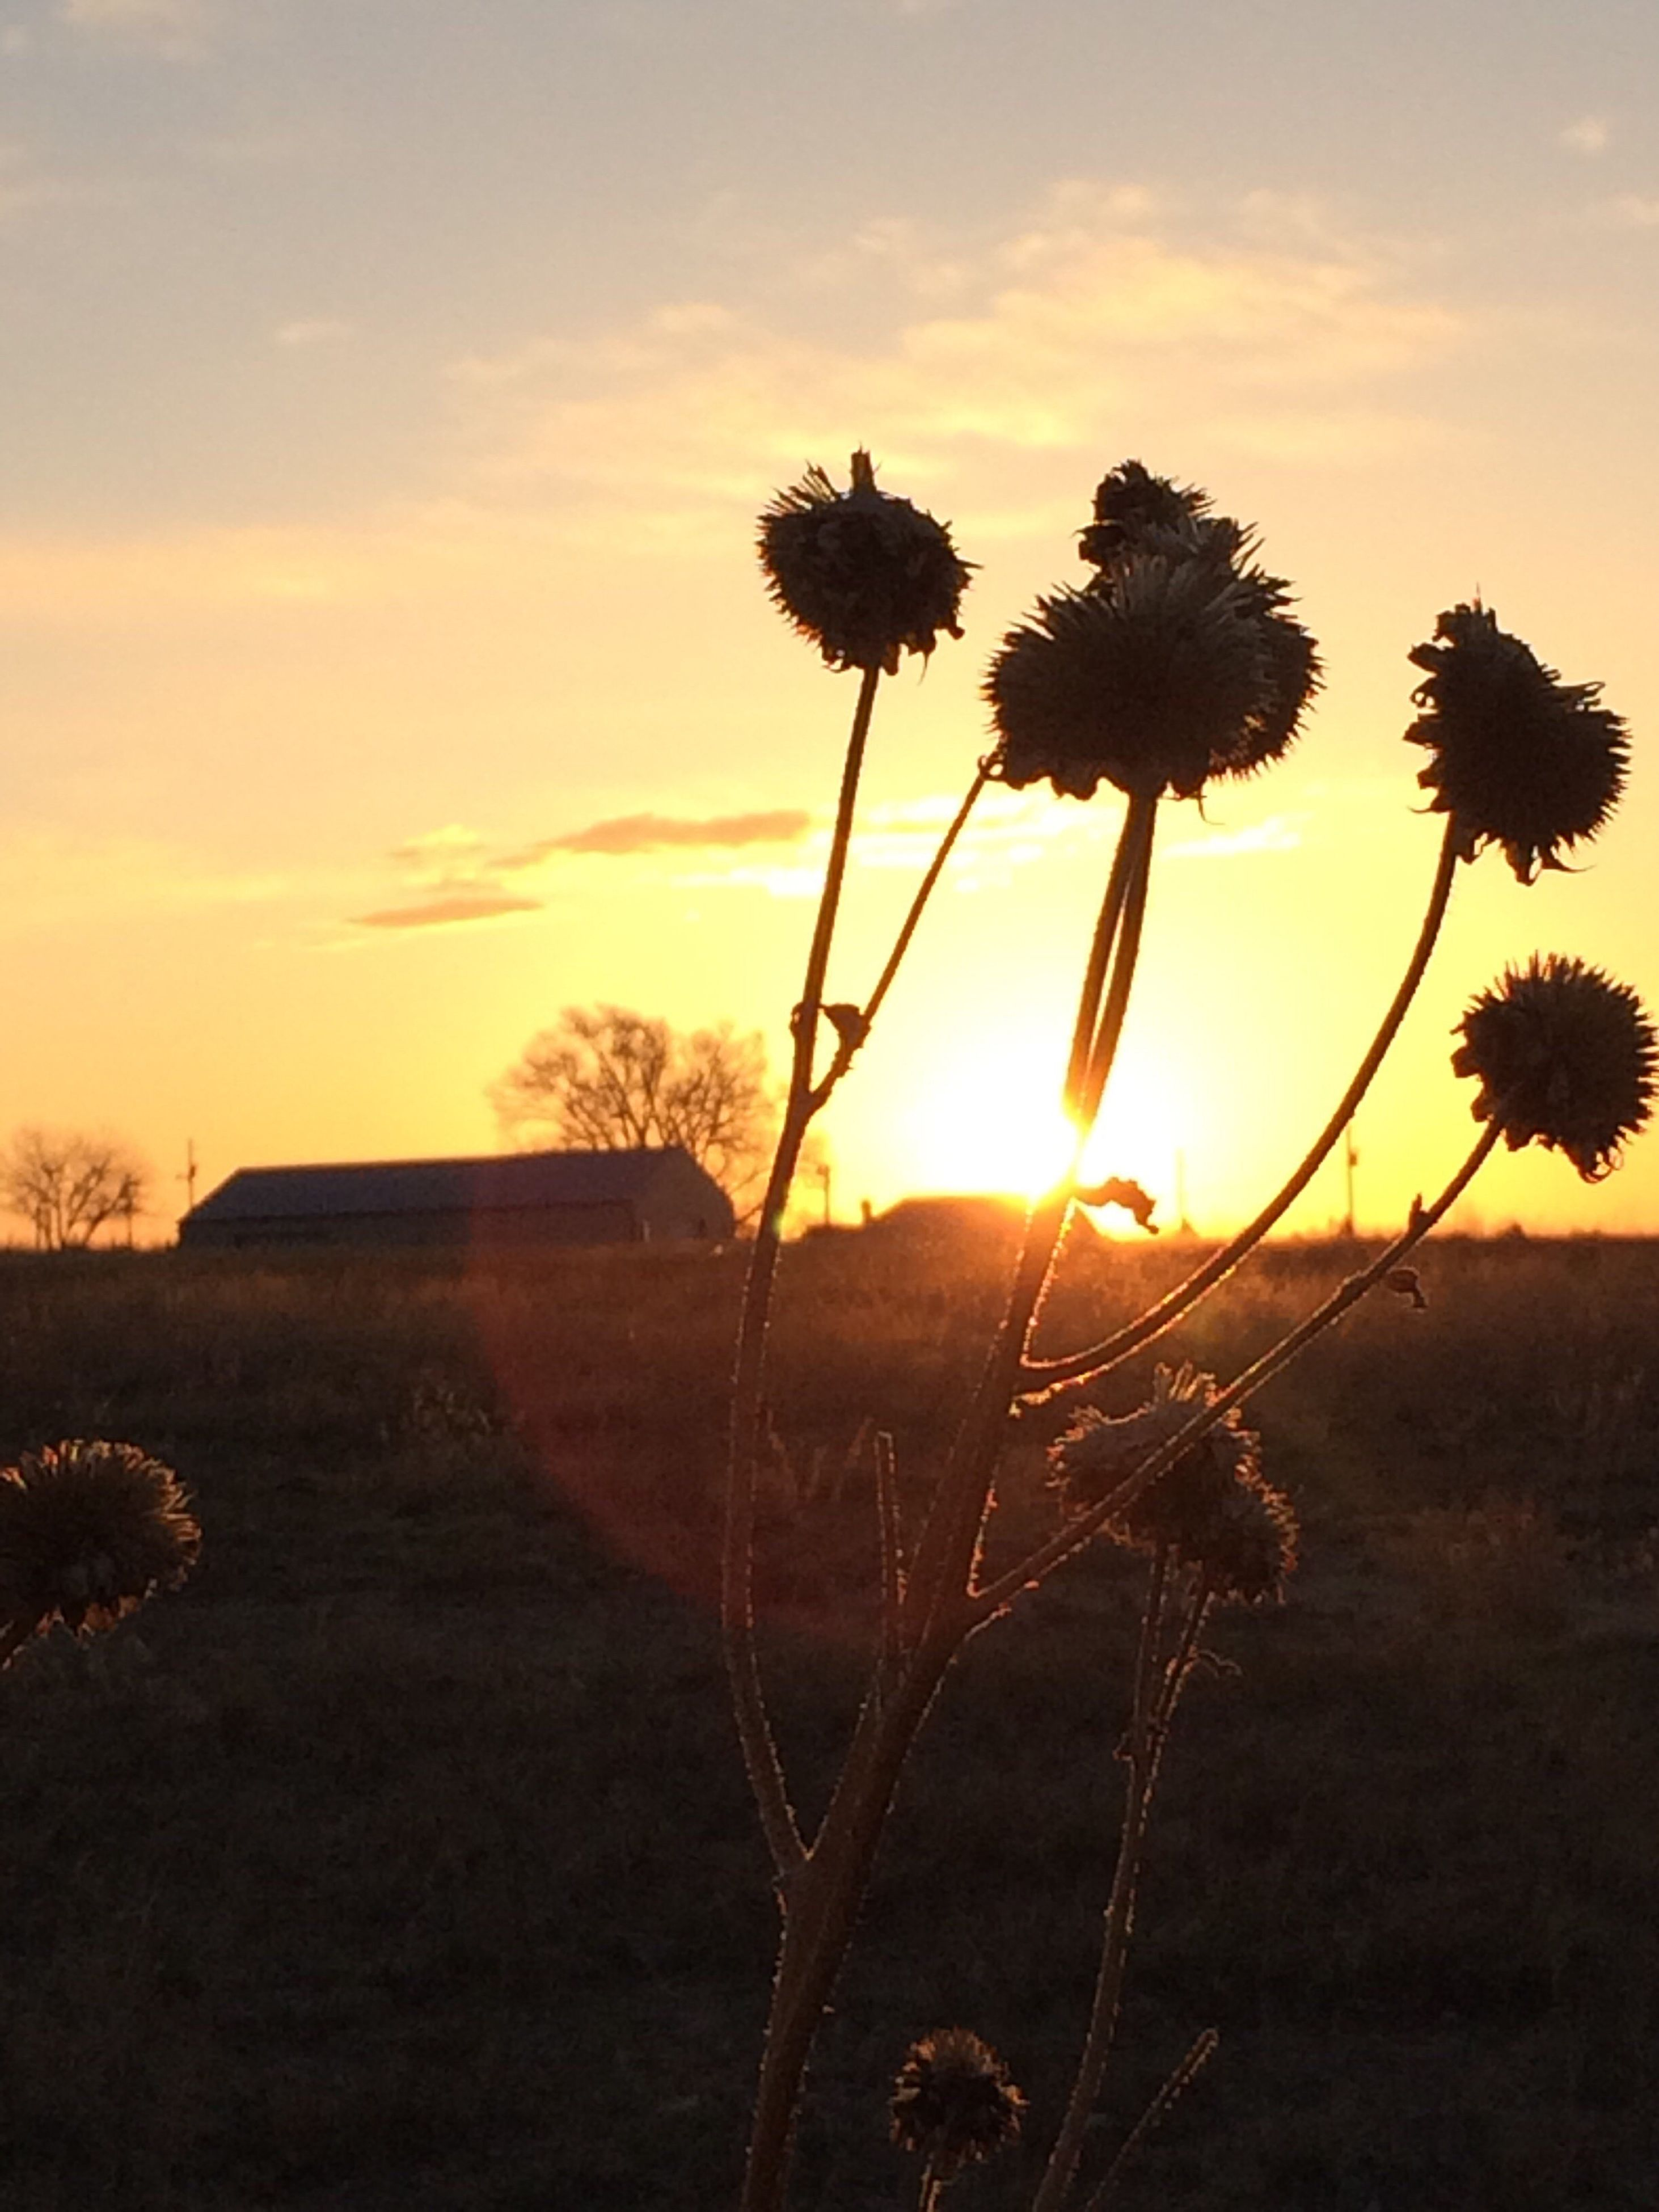 sunset, tranquil scene, tranquility, sun, beauty in nature, sky, scenics, silhouette, nature, orange color, tree, landscape, growth, field, sunlight, plant, idyllic, non-urban scene, back lit, no people